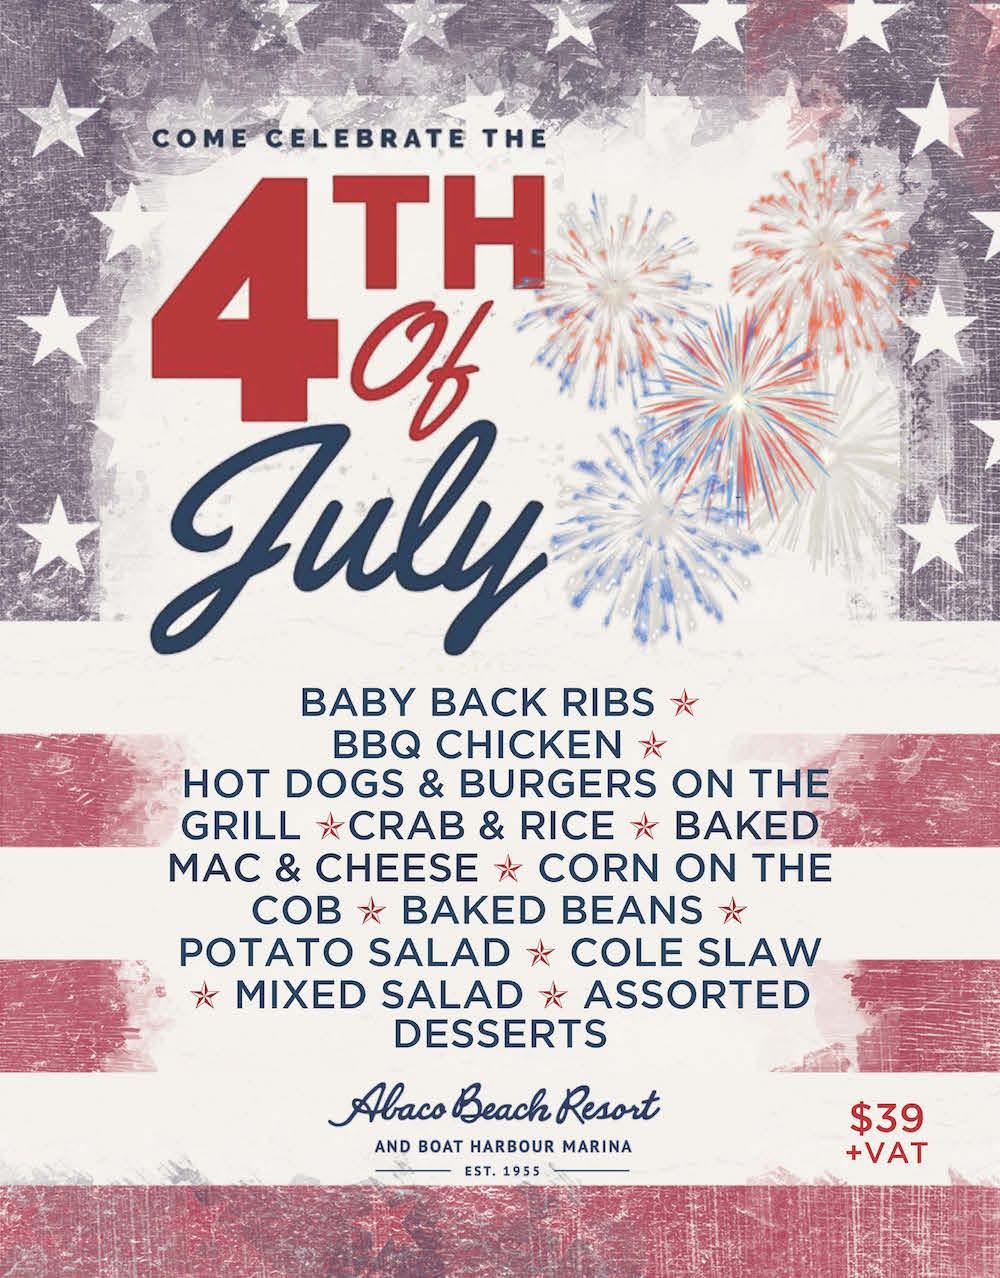 Abaco Beach Resort July 4th